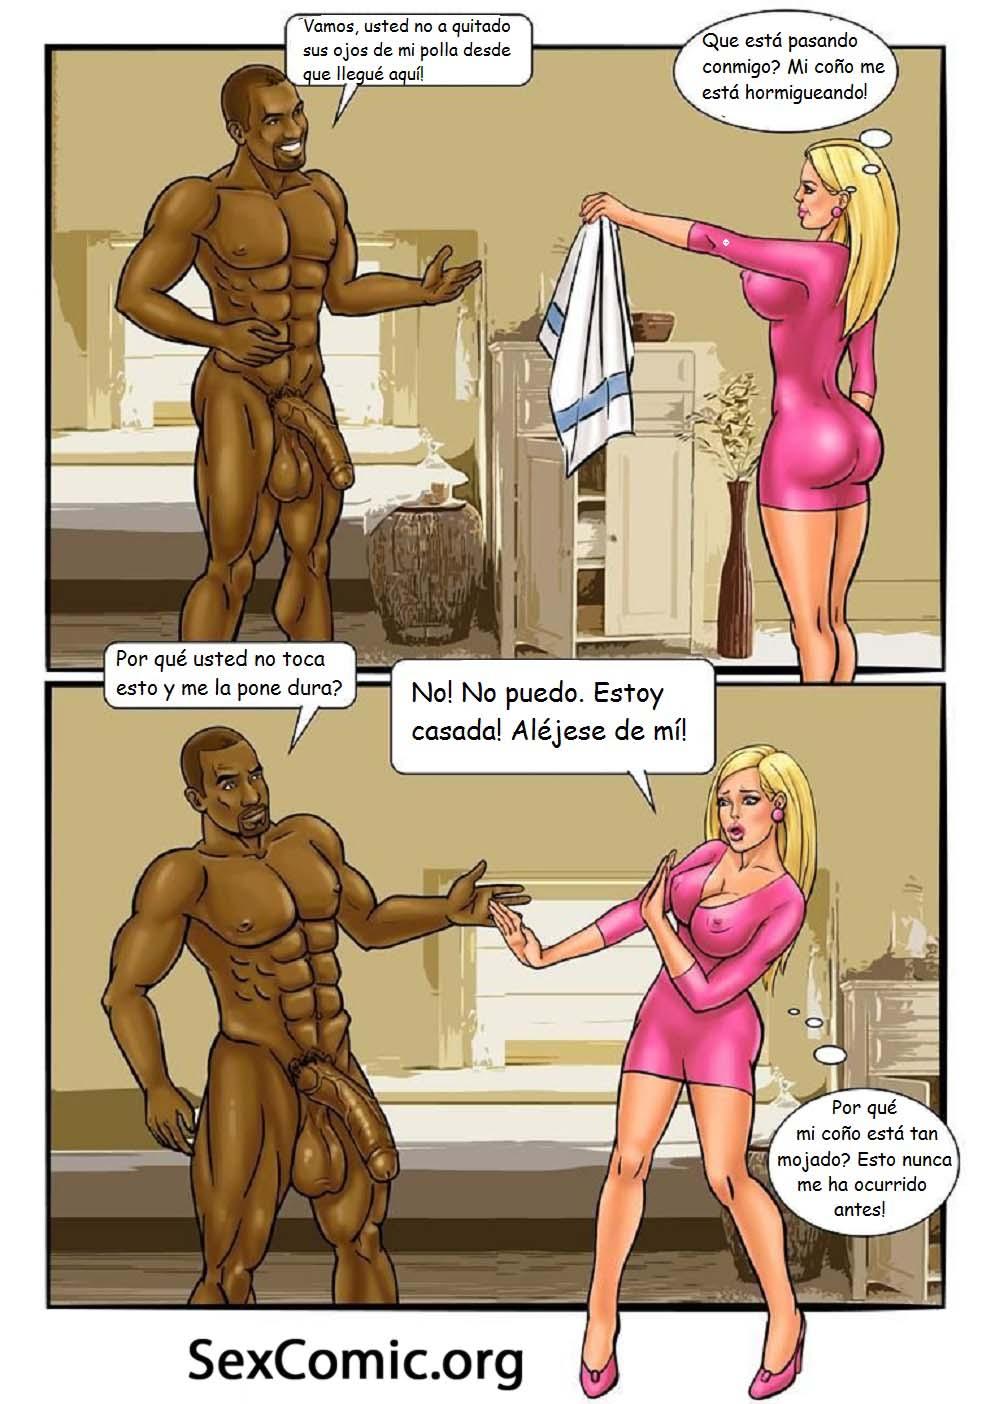 Mujer le es infiel a su marido dentro de su propia casa xxx - videos xxx -anime porno - manga xxx - historias porno - dibujos porno español - videos HD (1 (67)